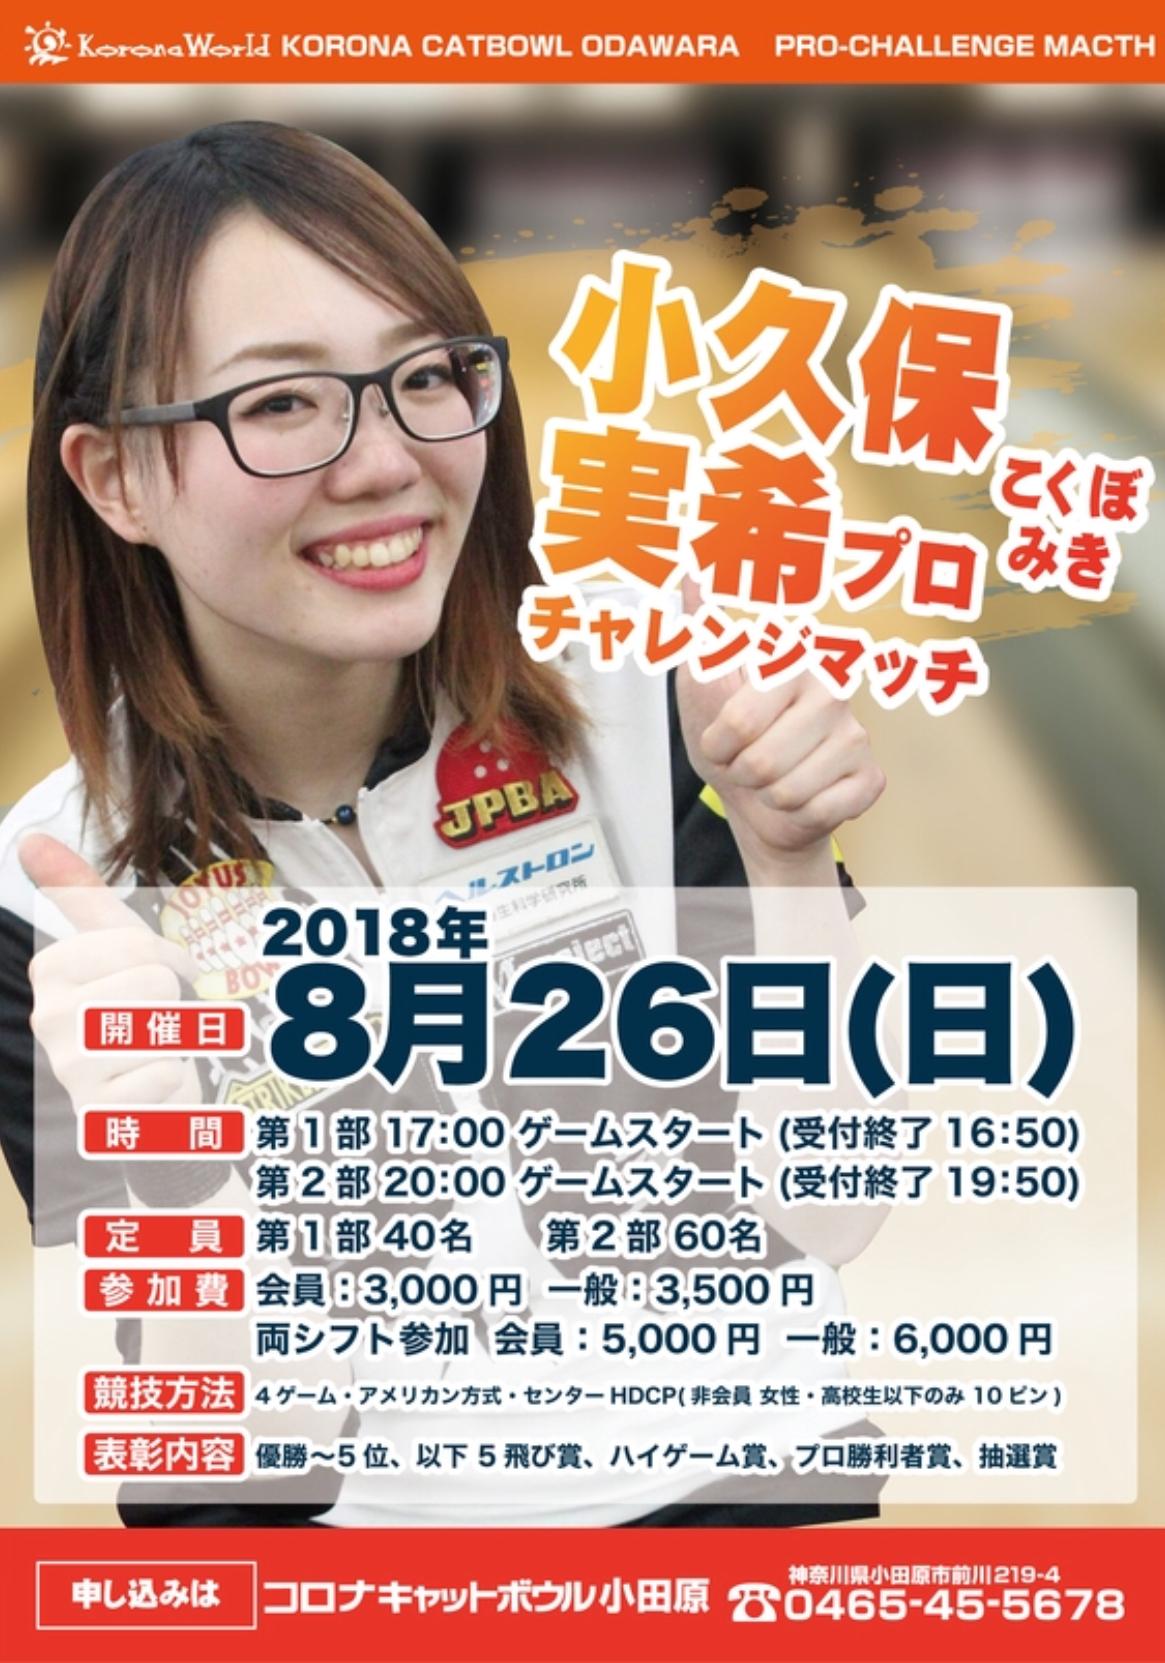 F88363EA-9A50-4C2F-9475-AC10EE18477B.jpeg